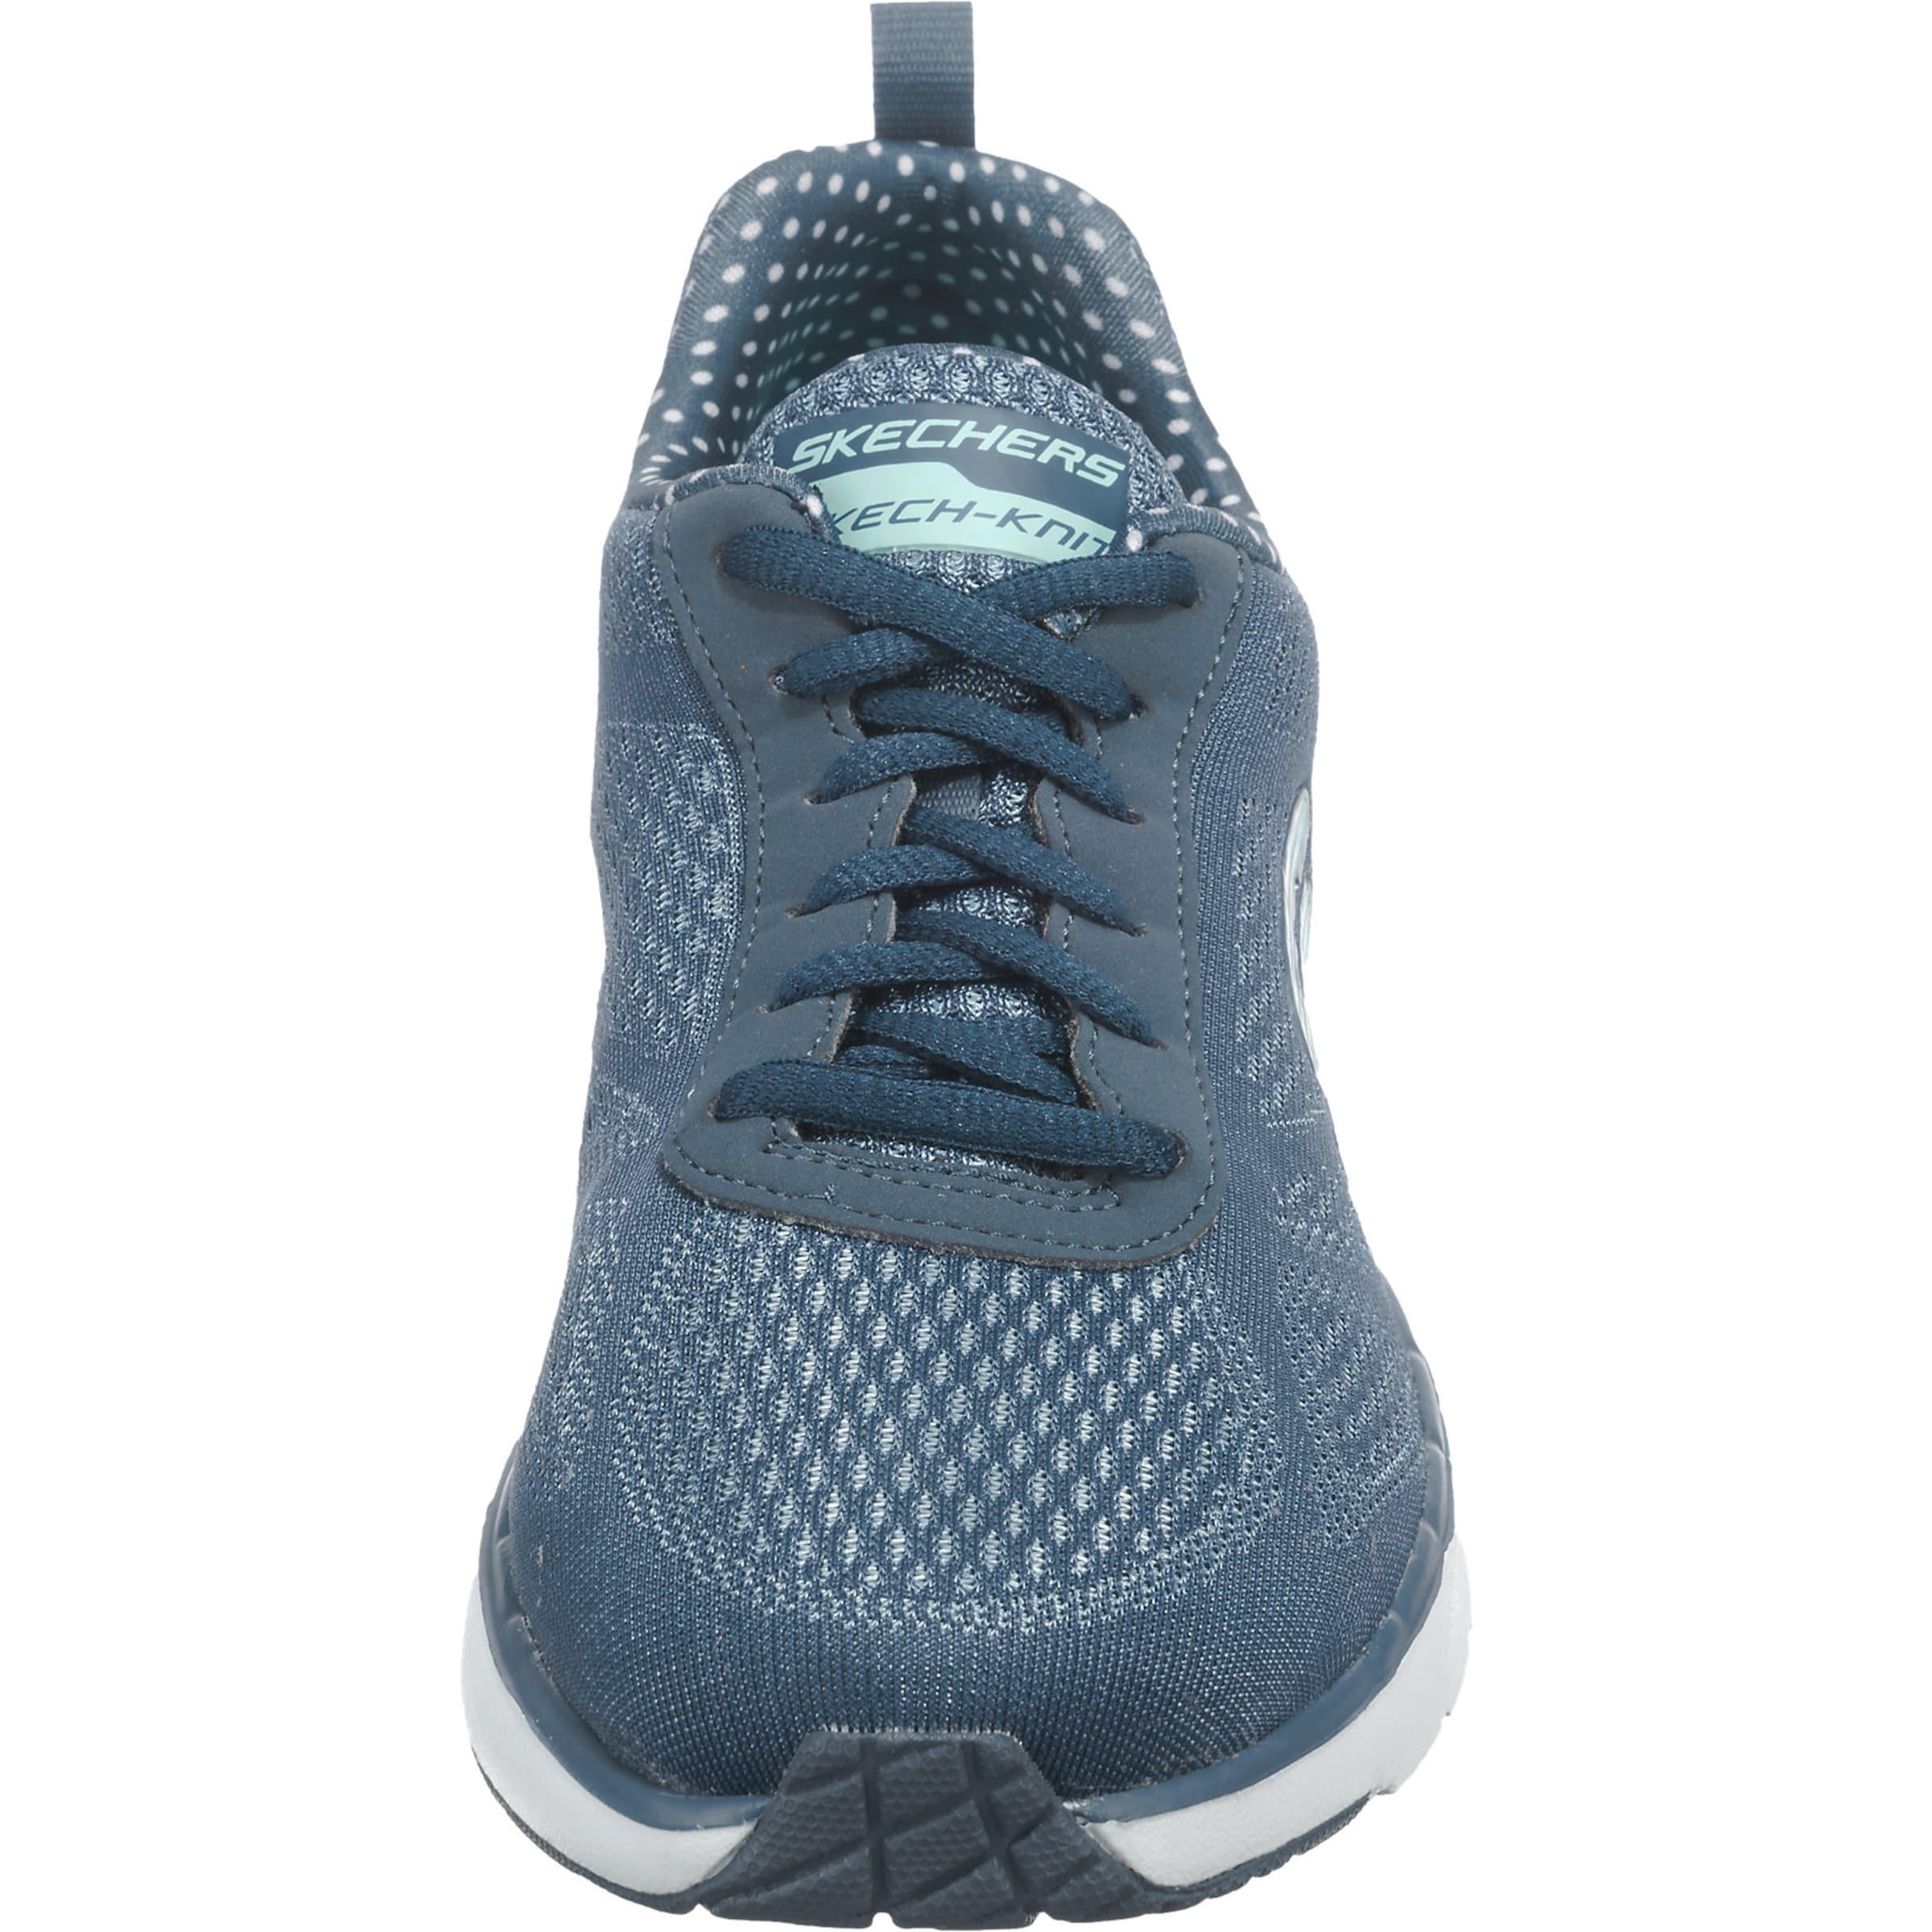 SKECHERS Sneaker mit Memory Foam Footlocker Finish Original Freier Versandauftrag FPRps7m